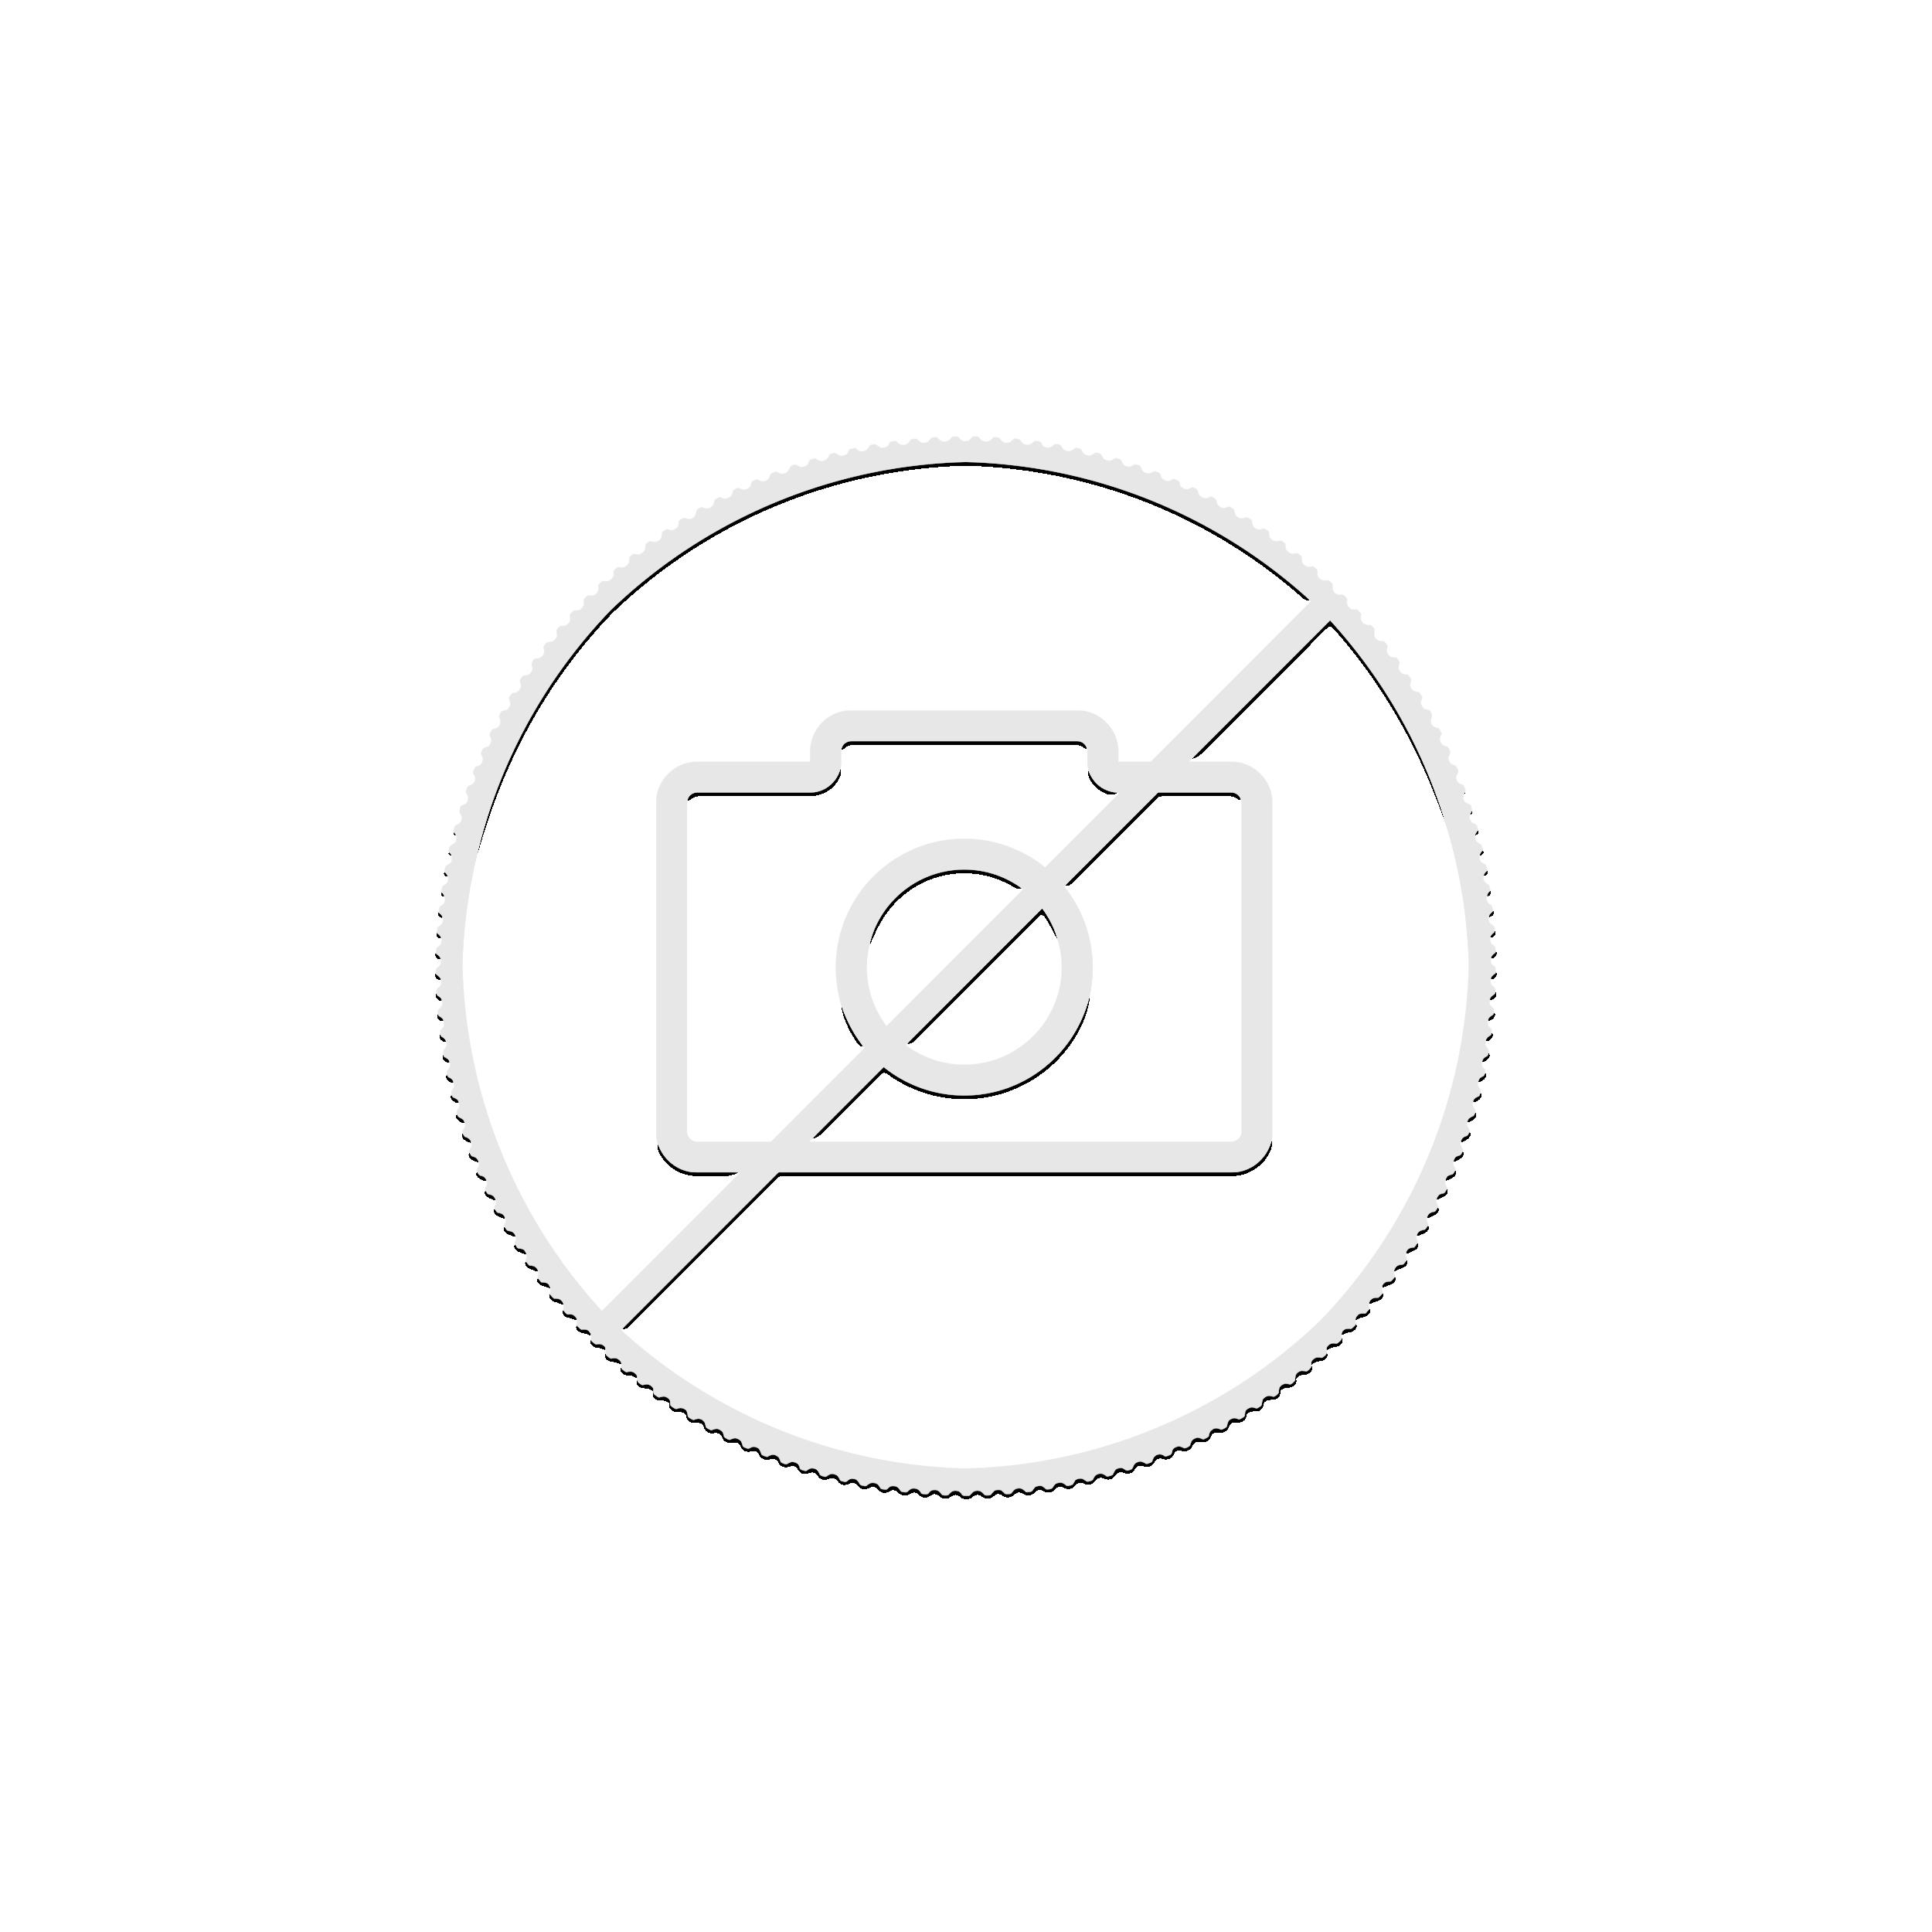 1 Kilo gouden Kangaroo munt 2021